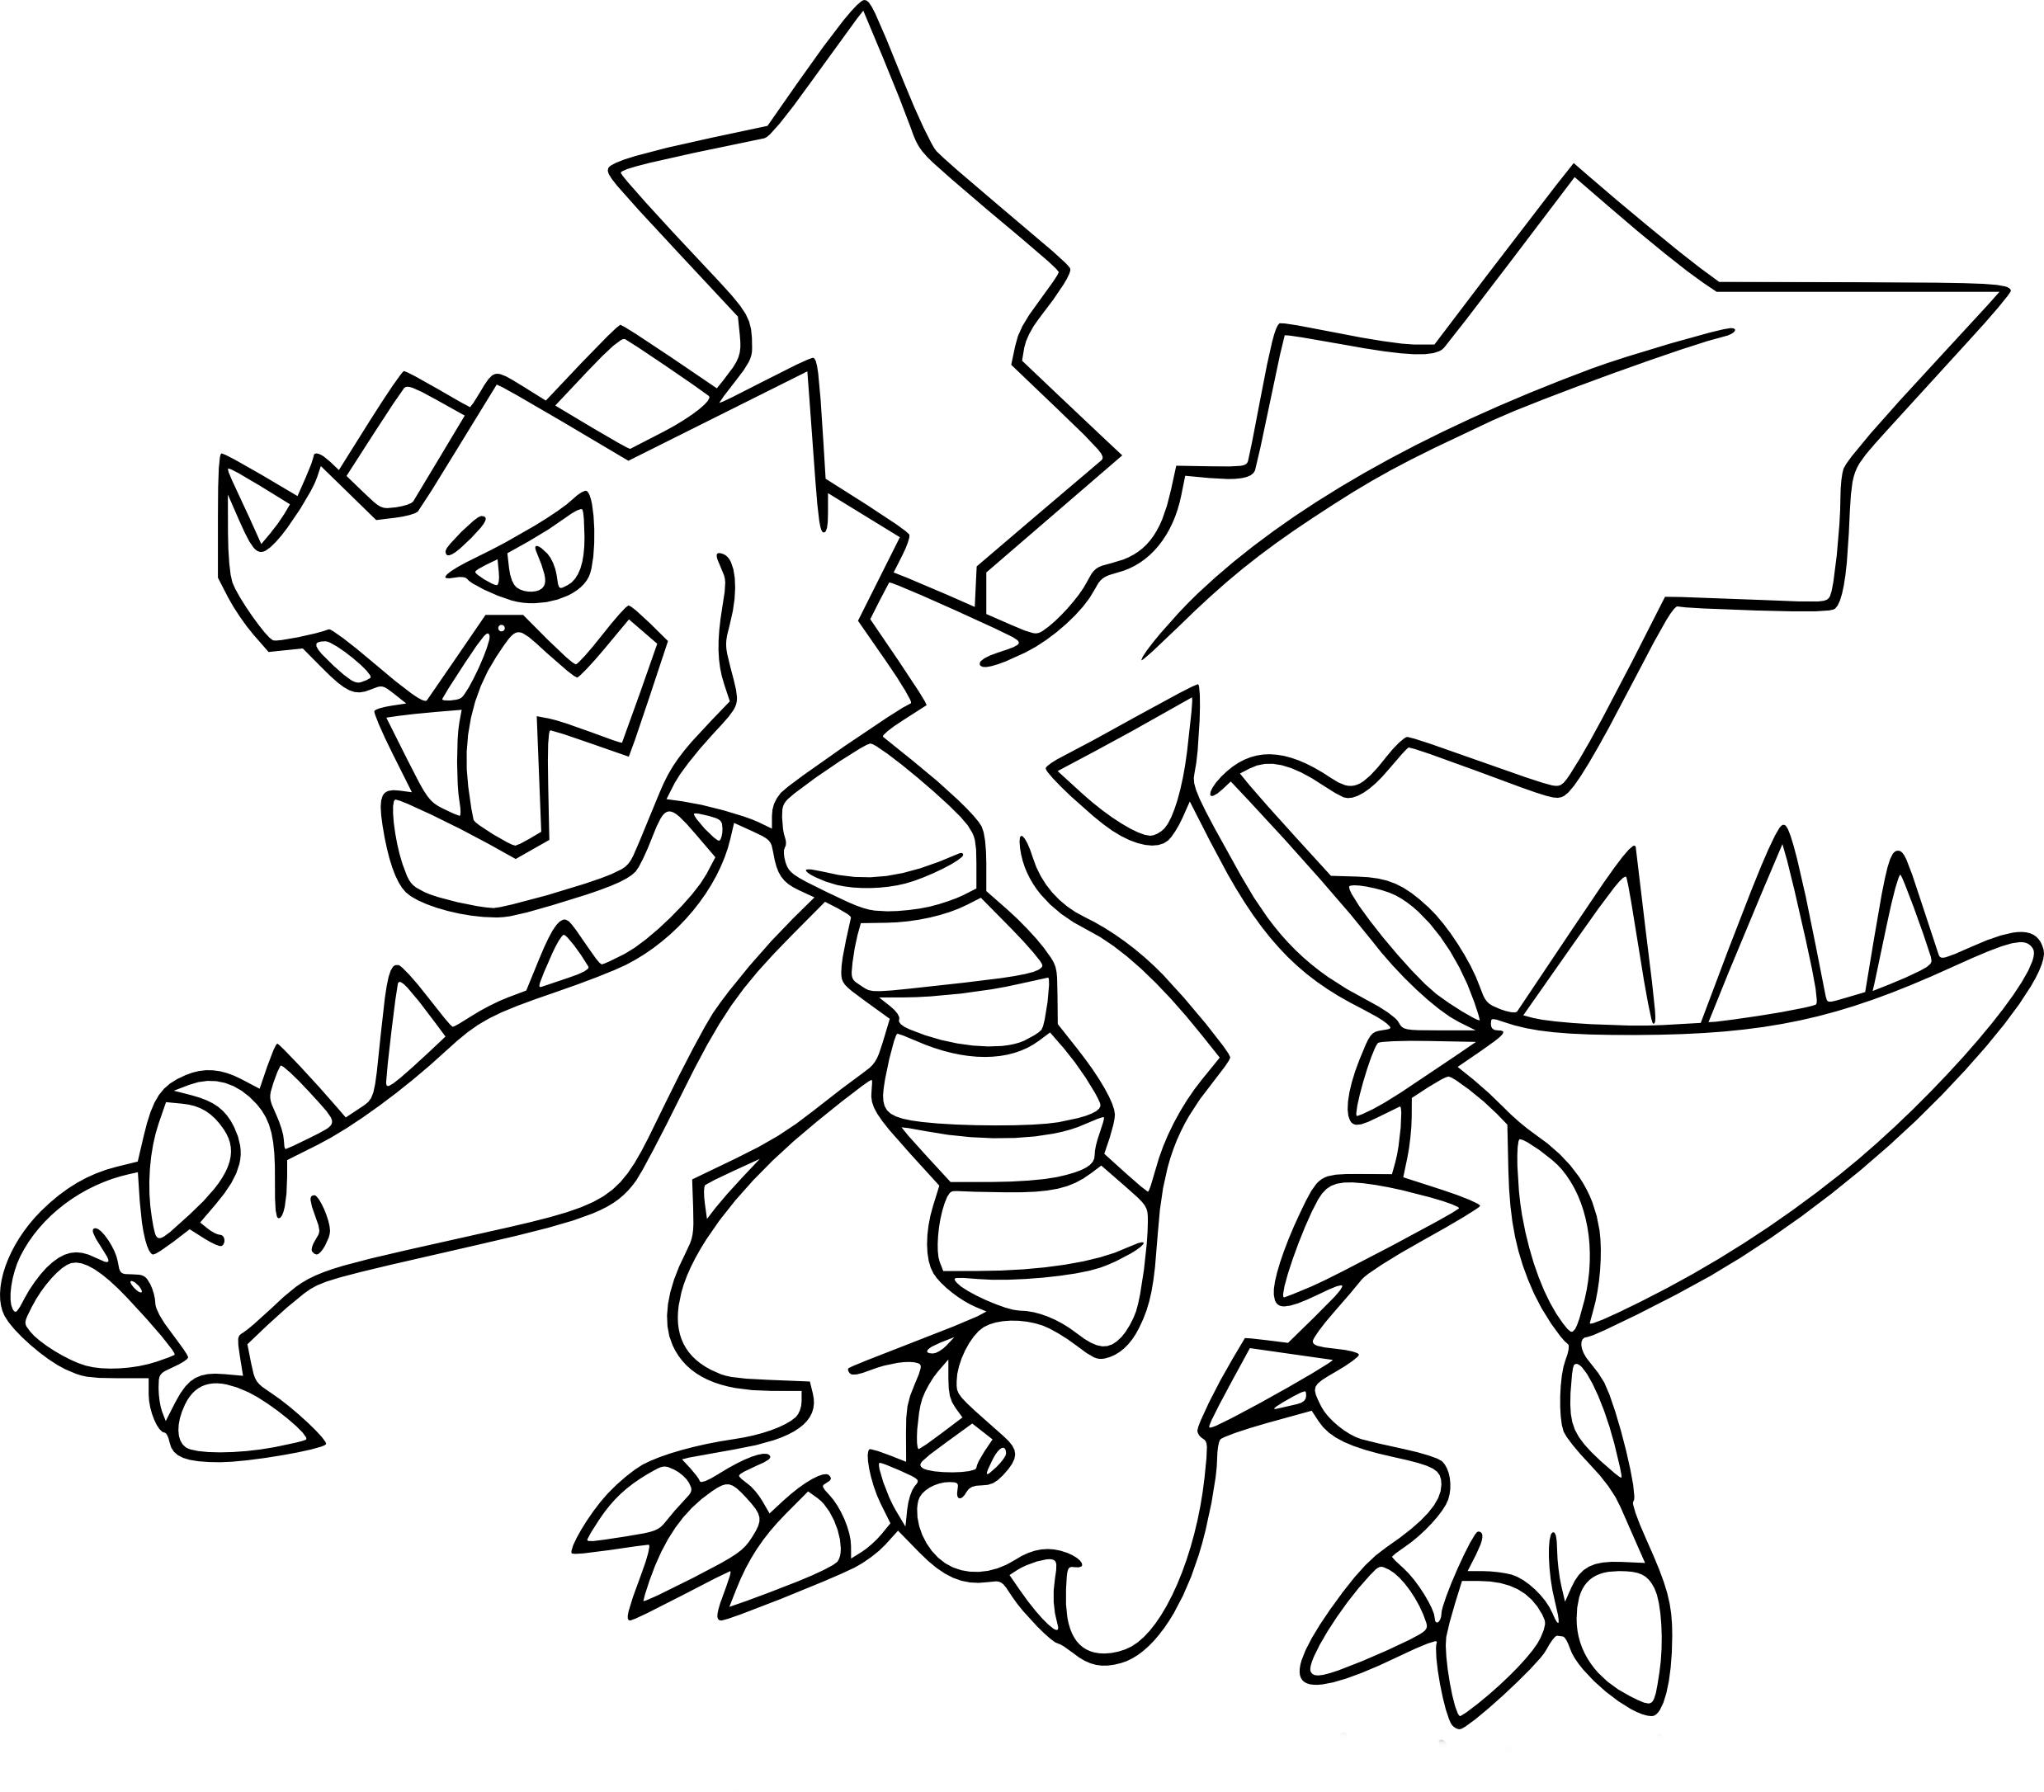 Coloriage drakkarmin pokemon imprimer - Coloriage pokemon imprimer ...